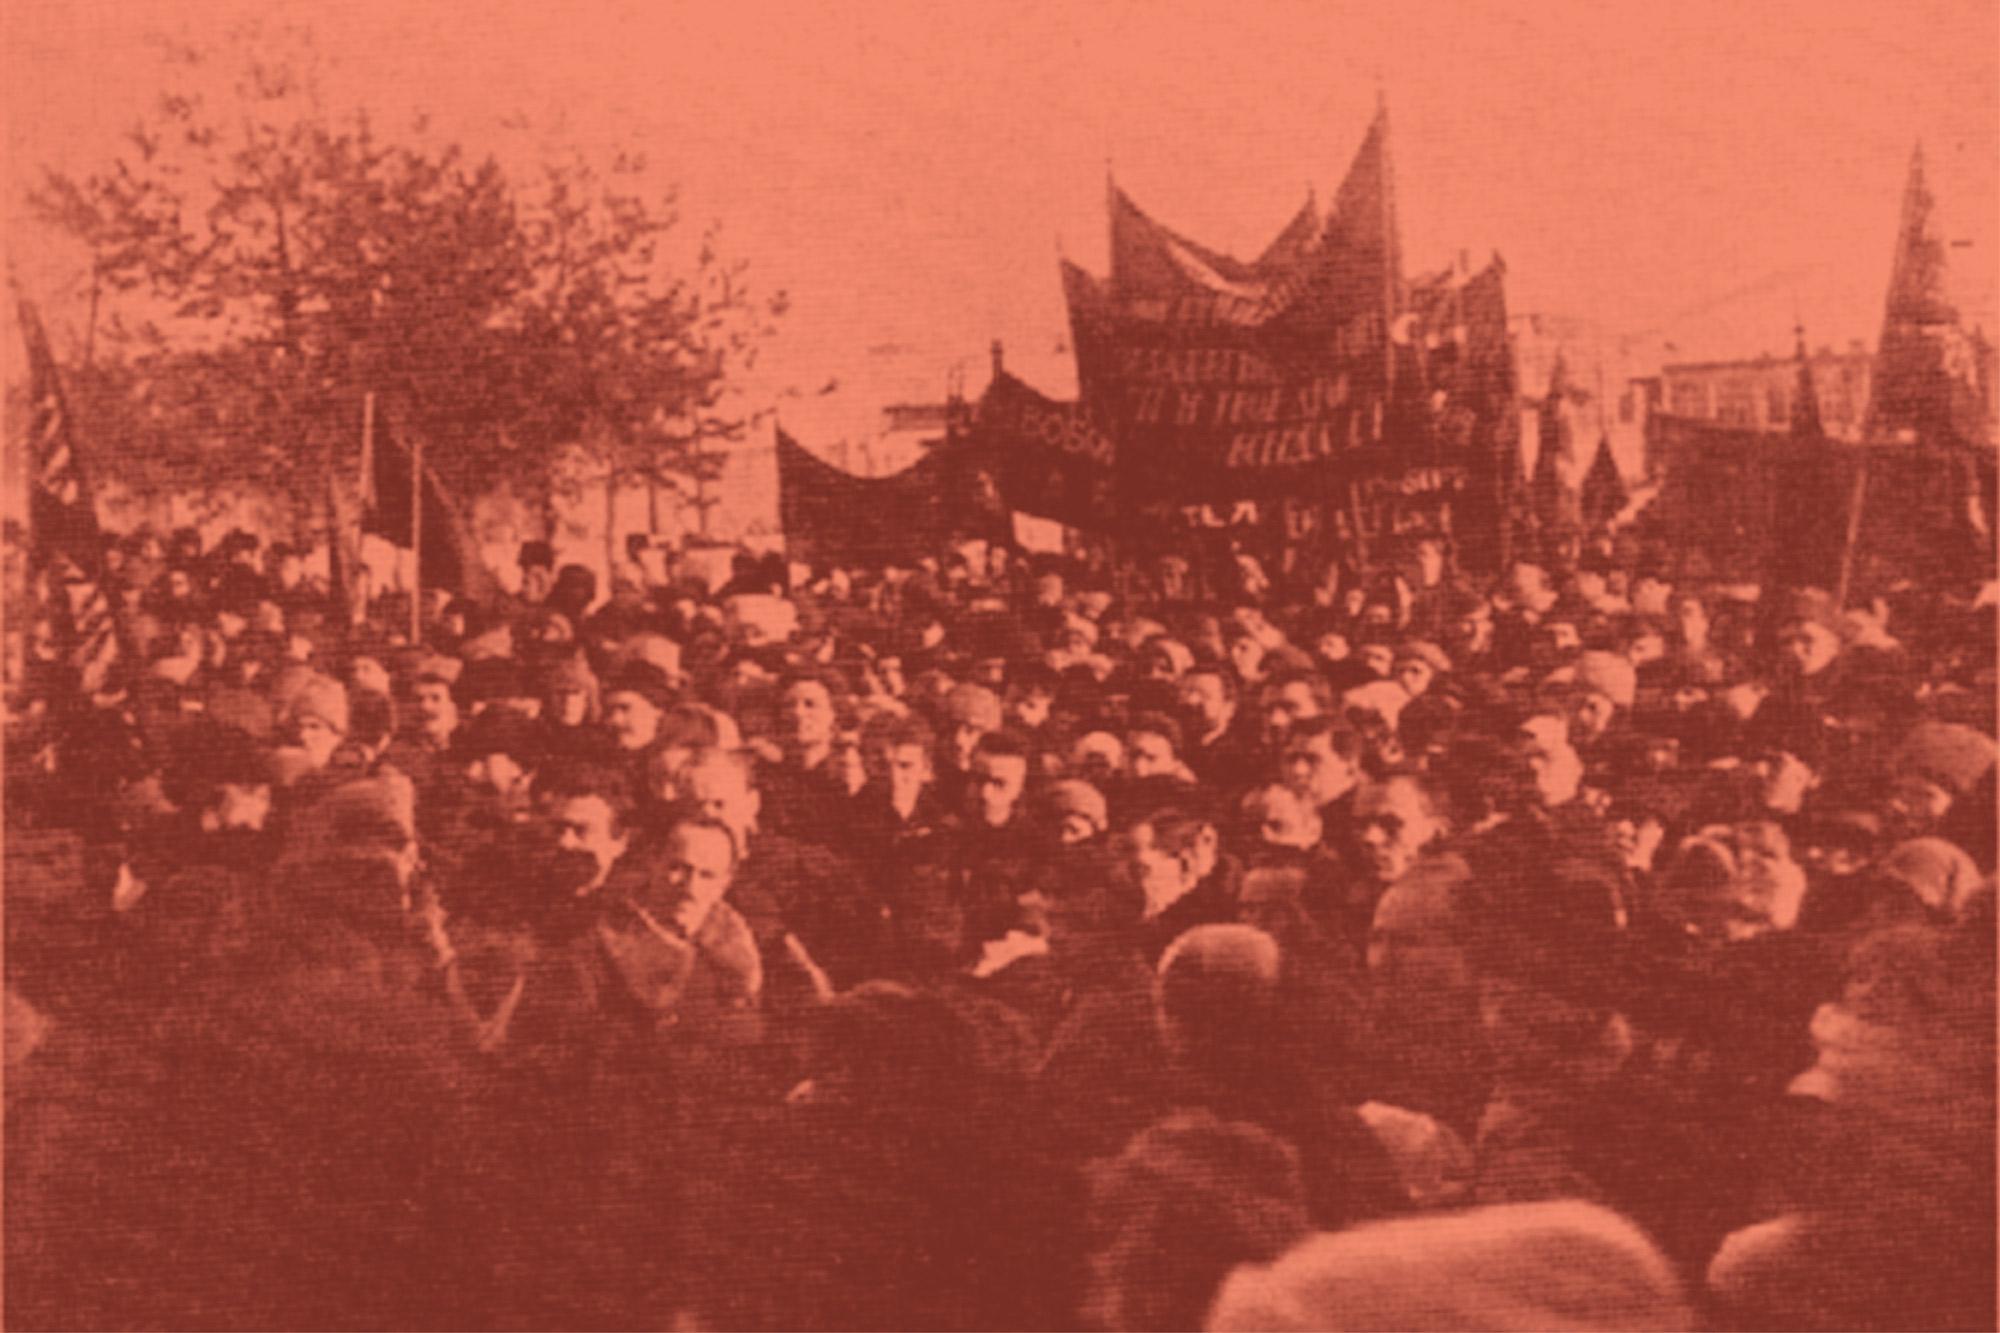 Peter Kropotkin's funeral, February 13, 1921.